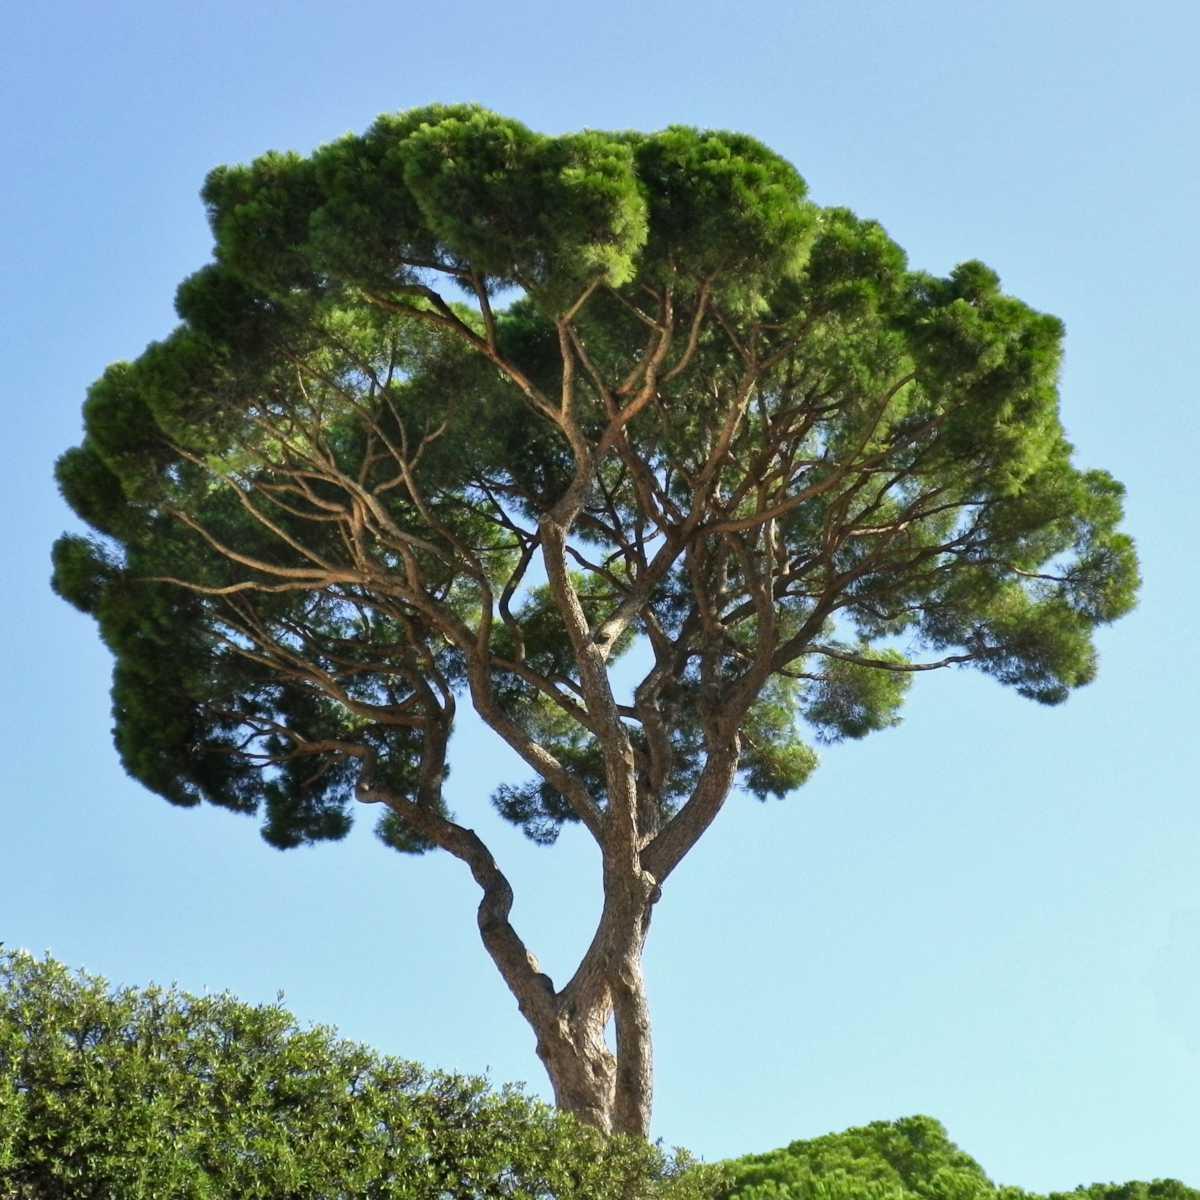 Stone pine tree seen from below